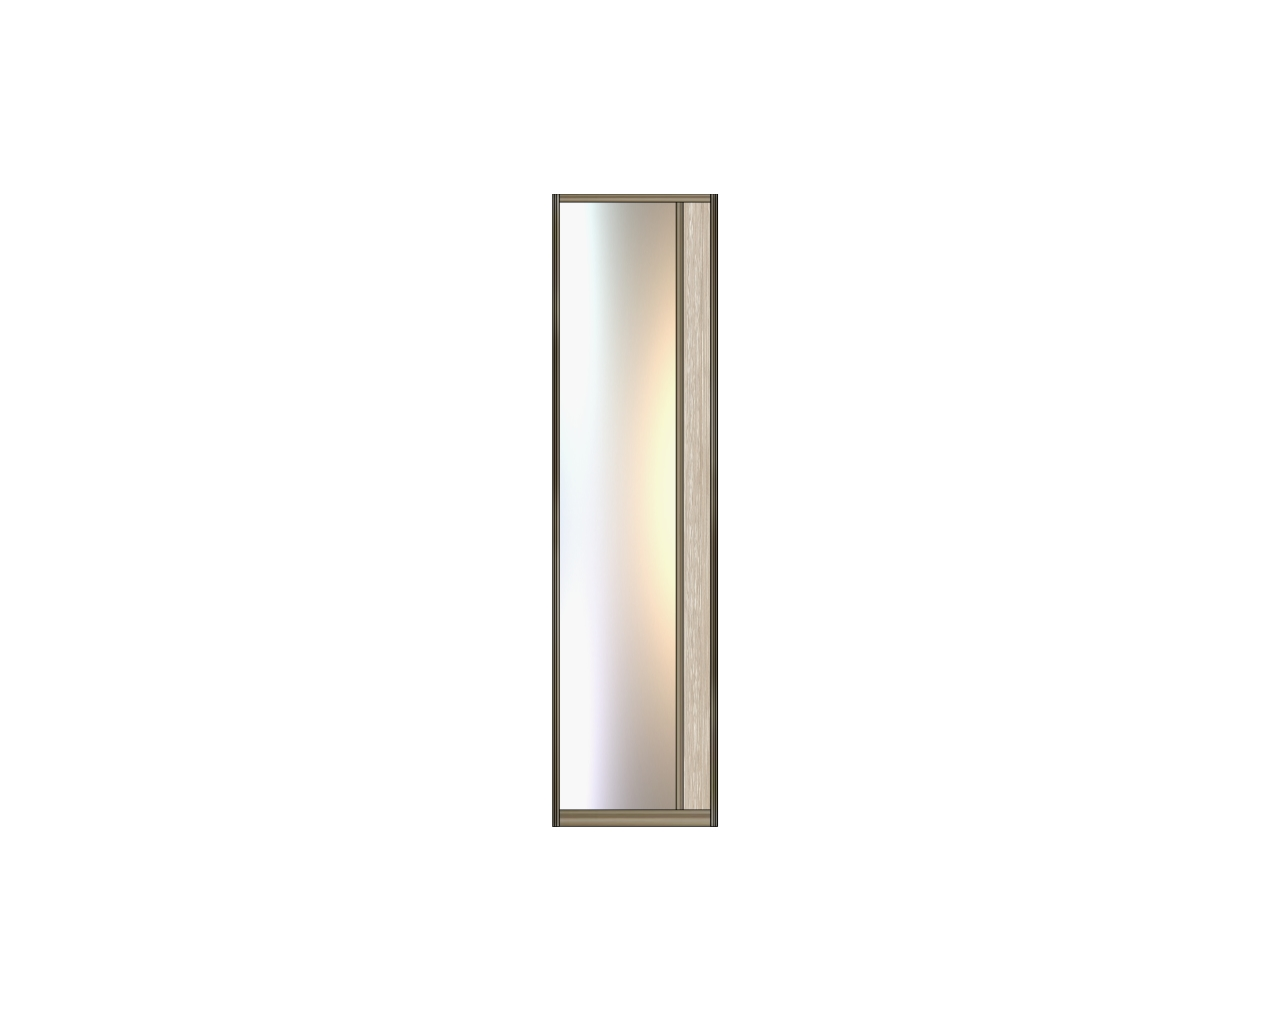 Модель 21-22 полотно Зеркало серебро — вставка 100 мм ЛДСП 550 мм